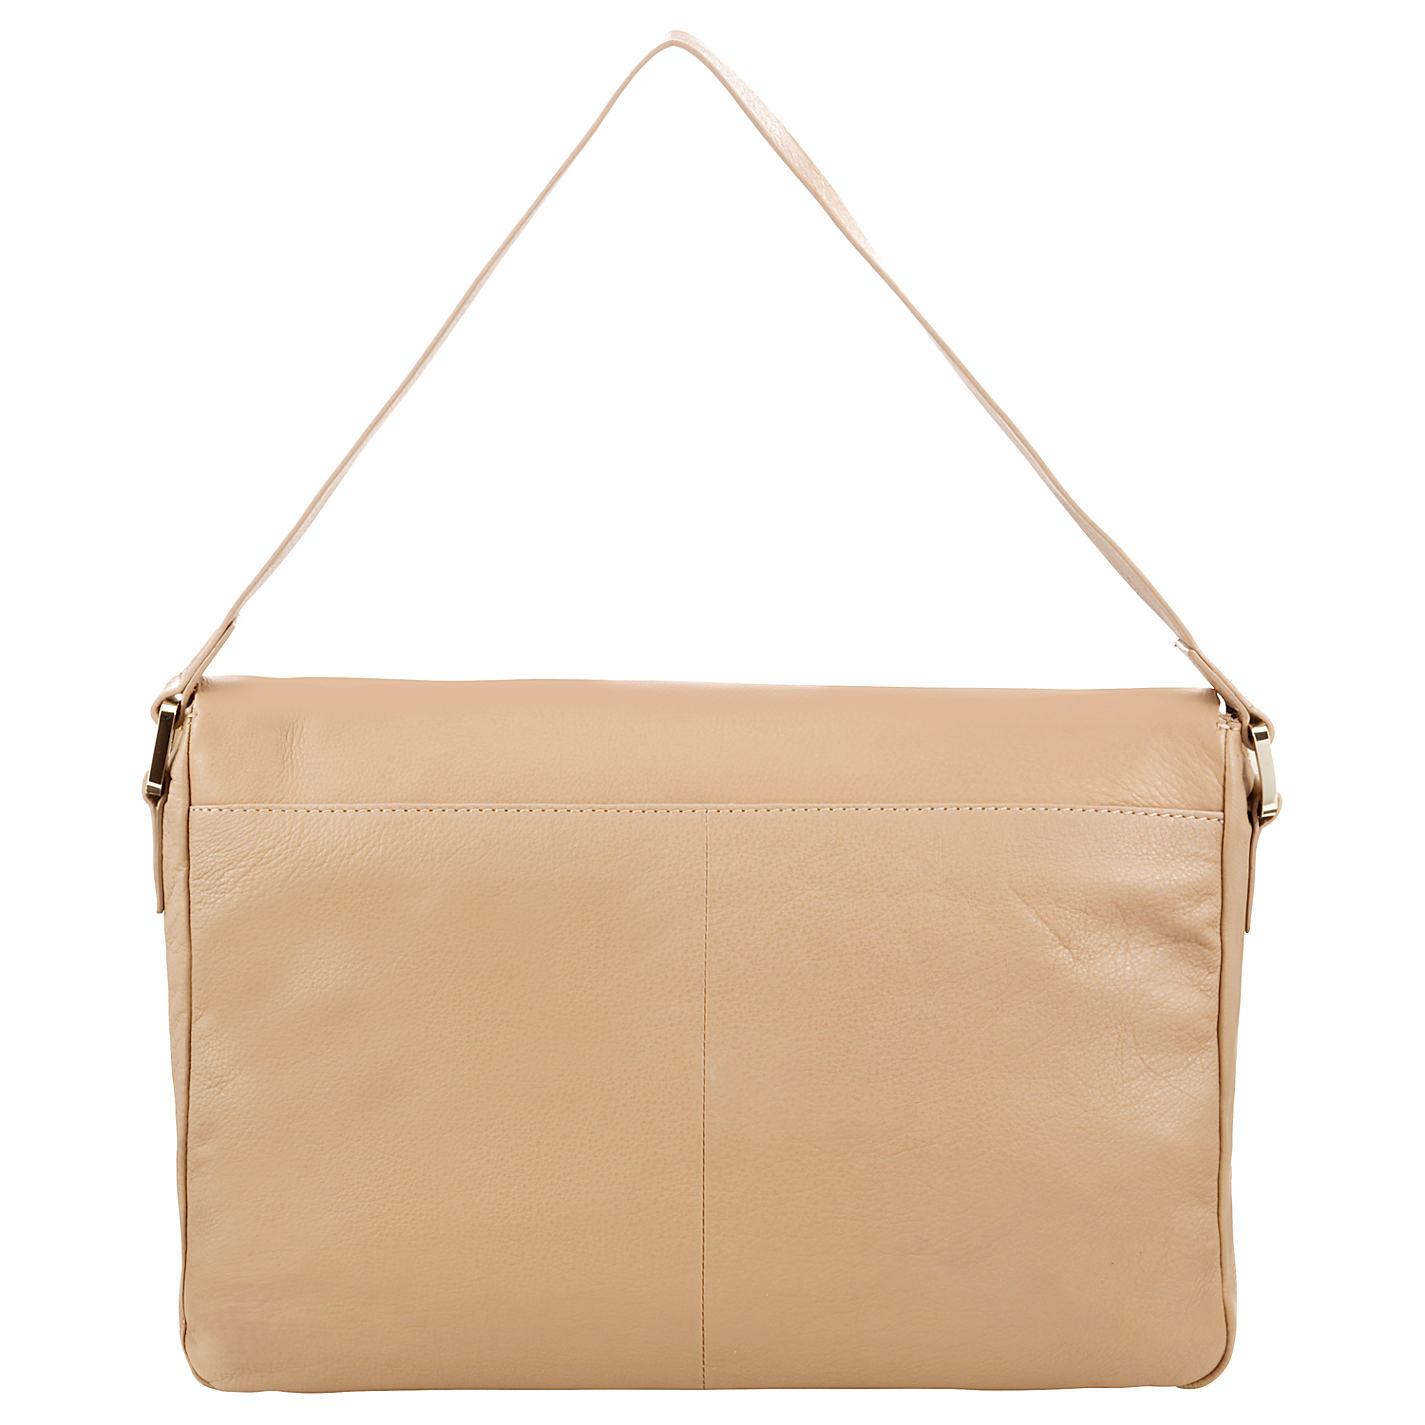 Handbags Shoulder Bags Designer Leather Handbags John Lewis 96